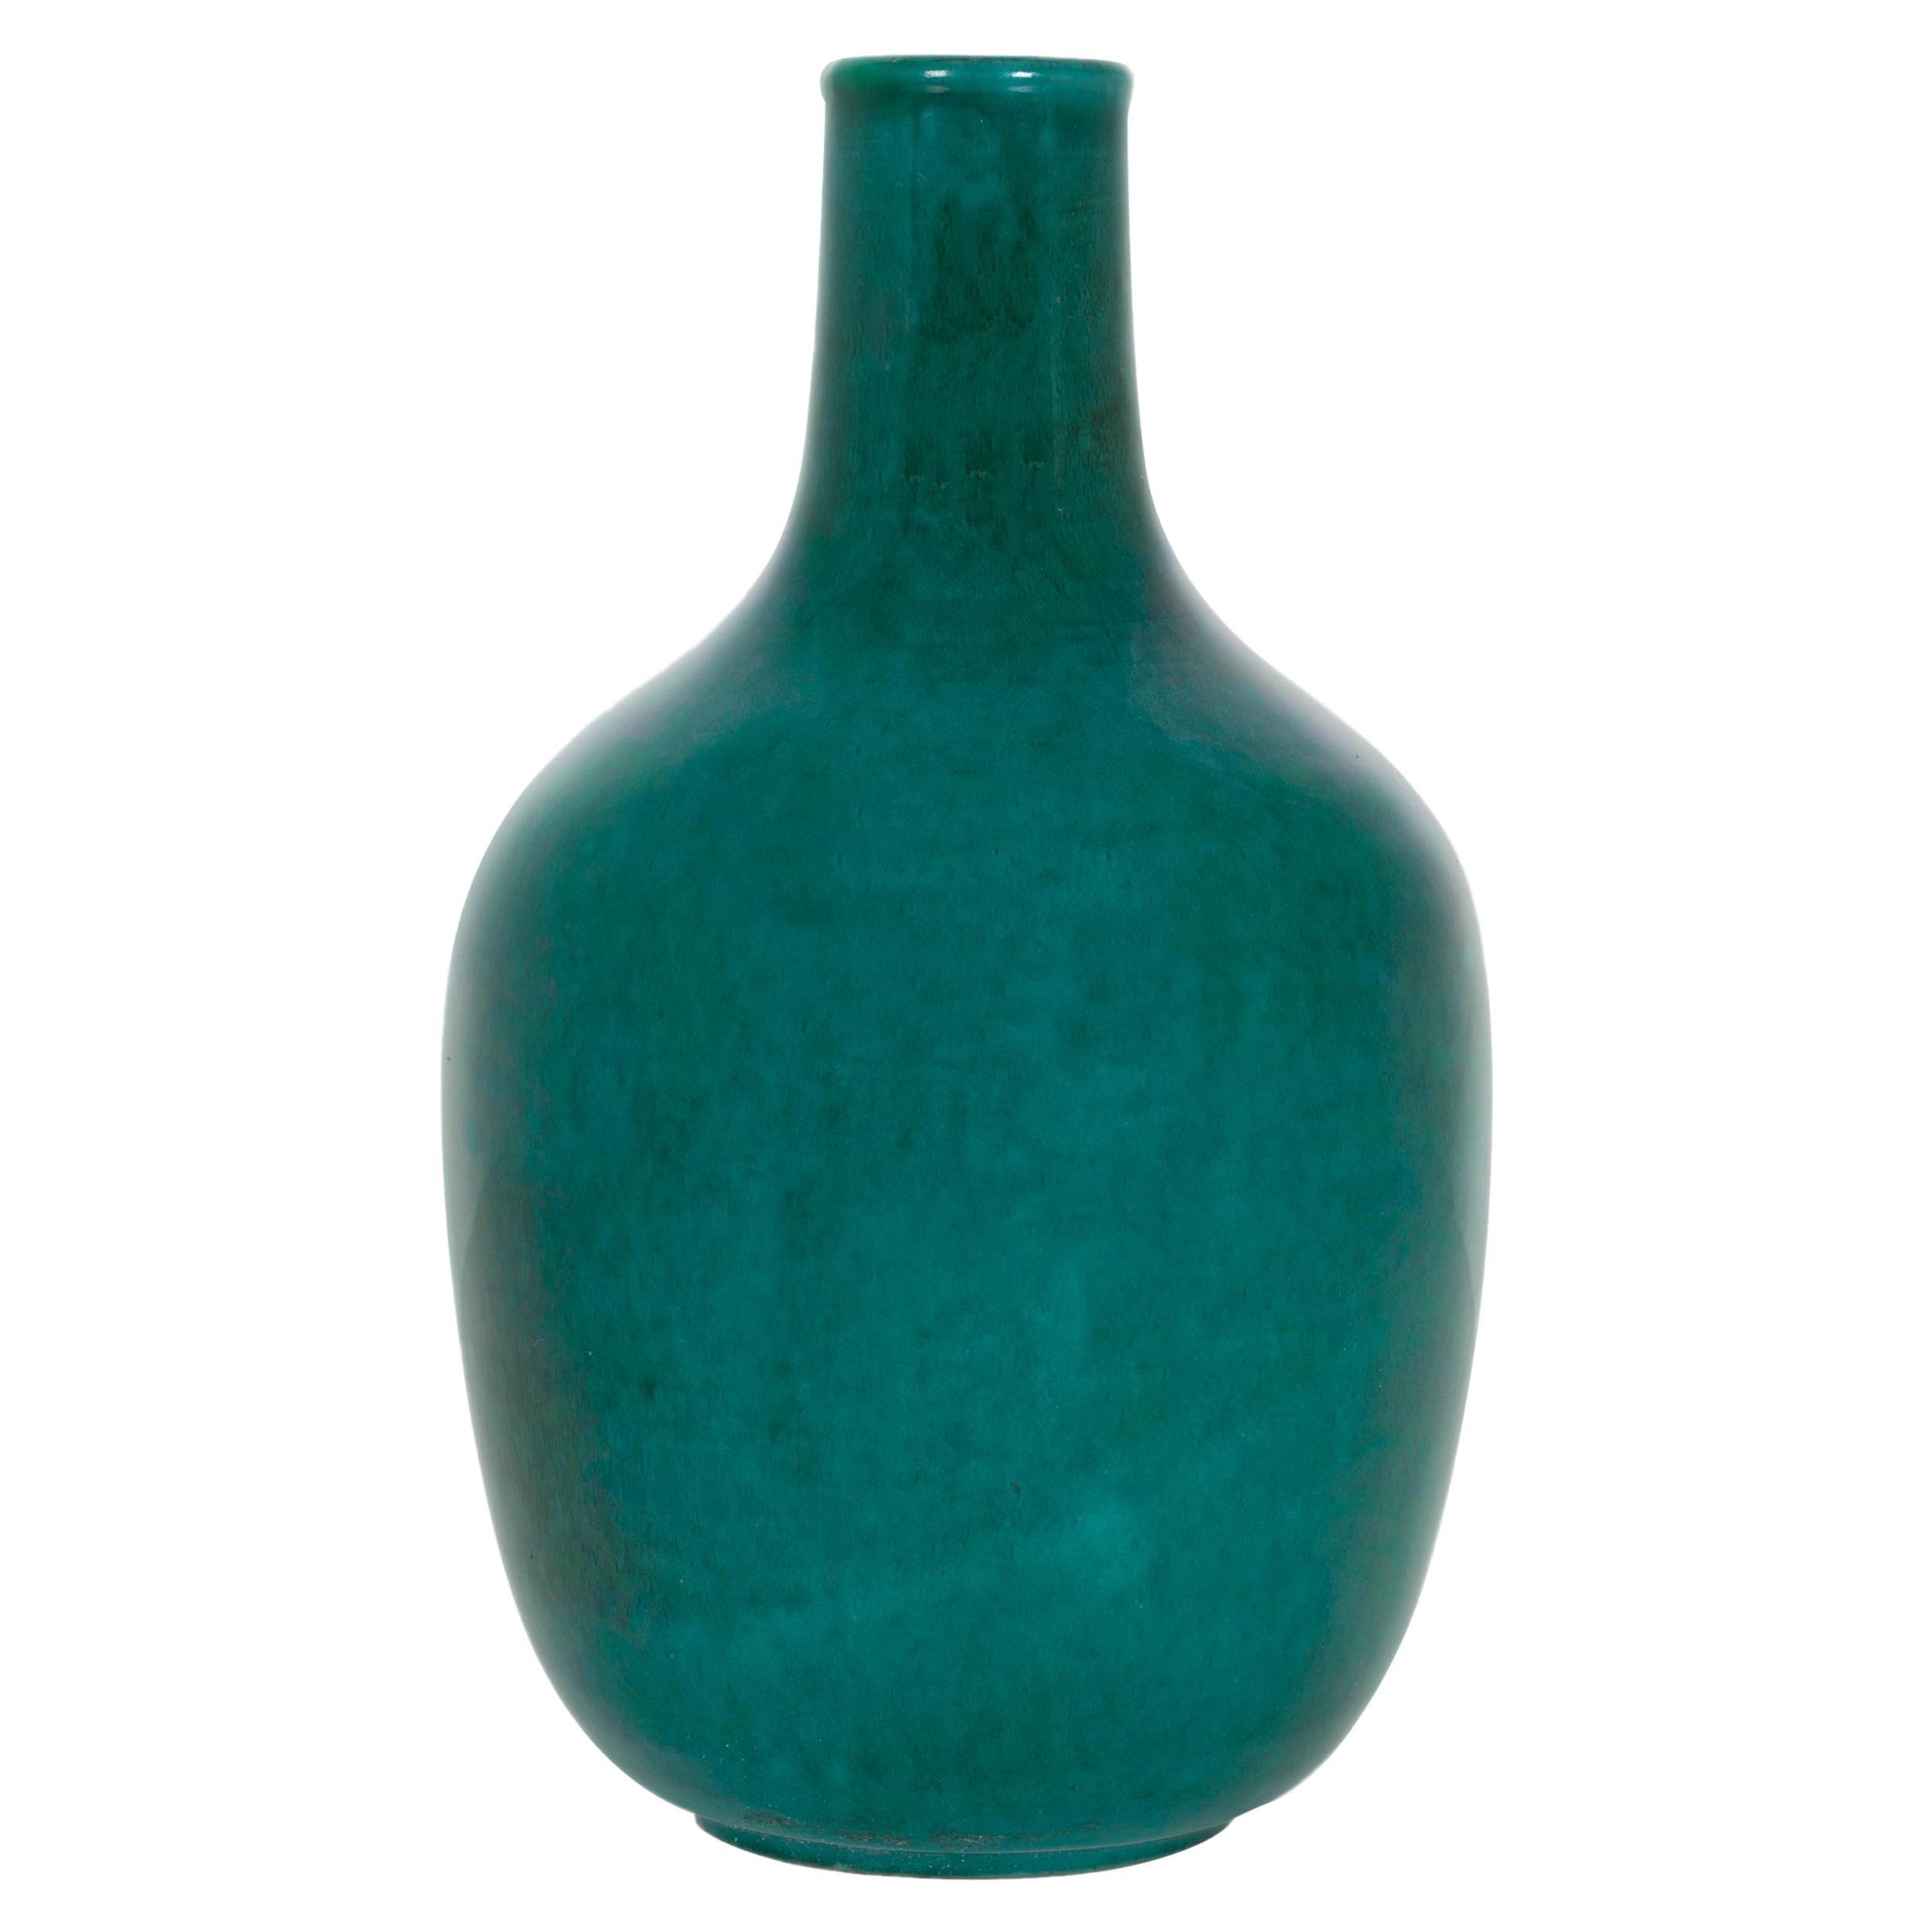 Early Fantoni Vase